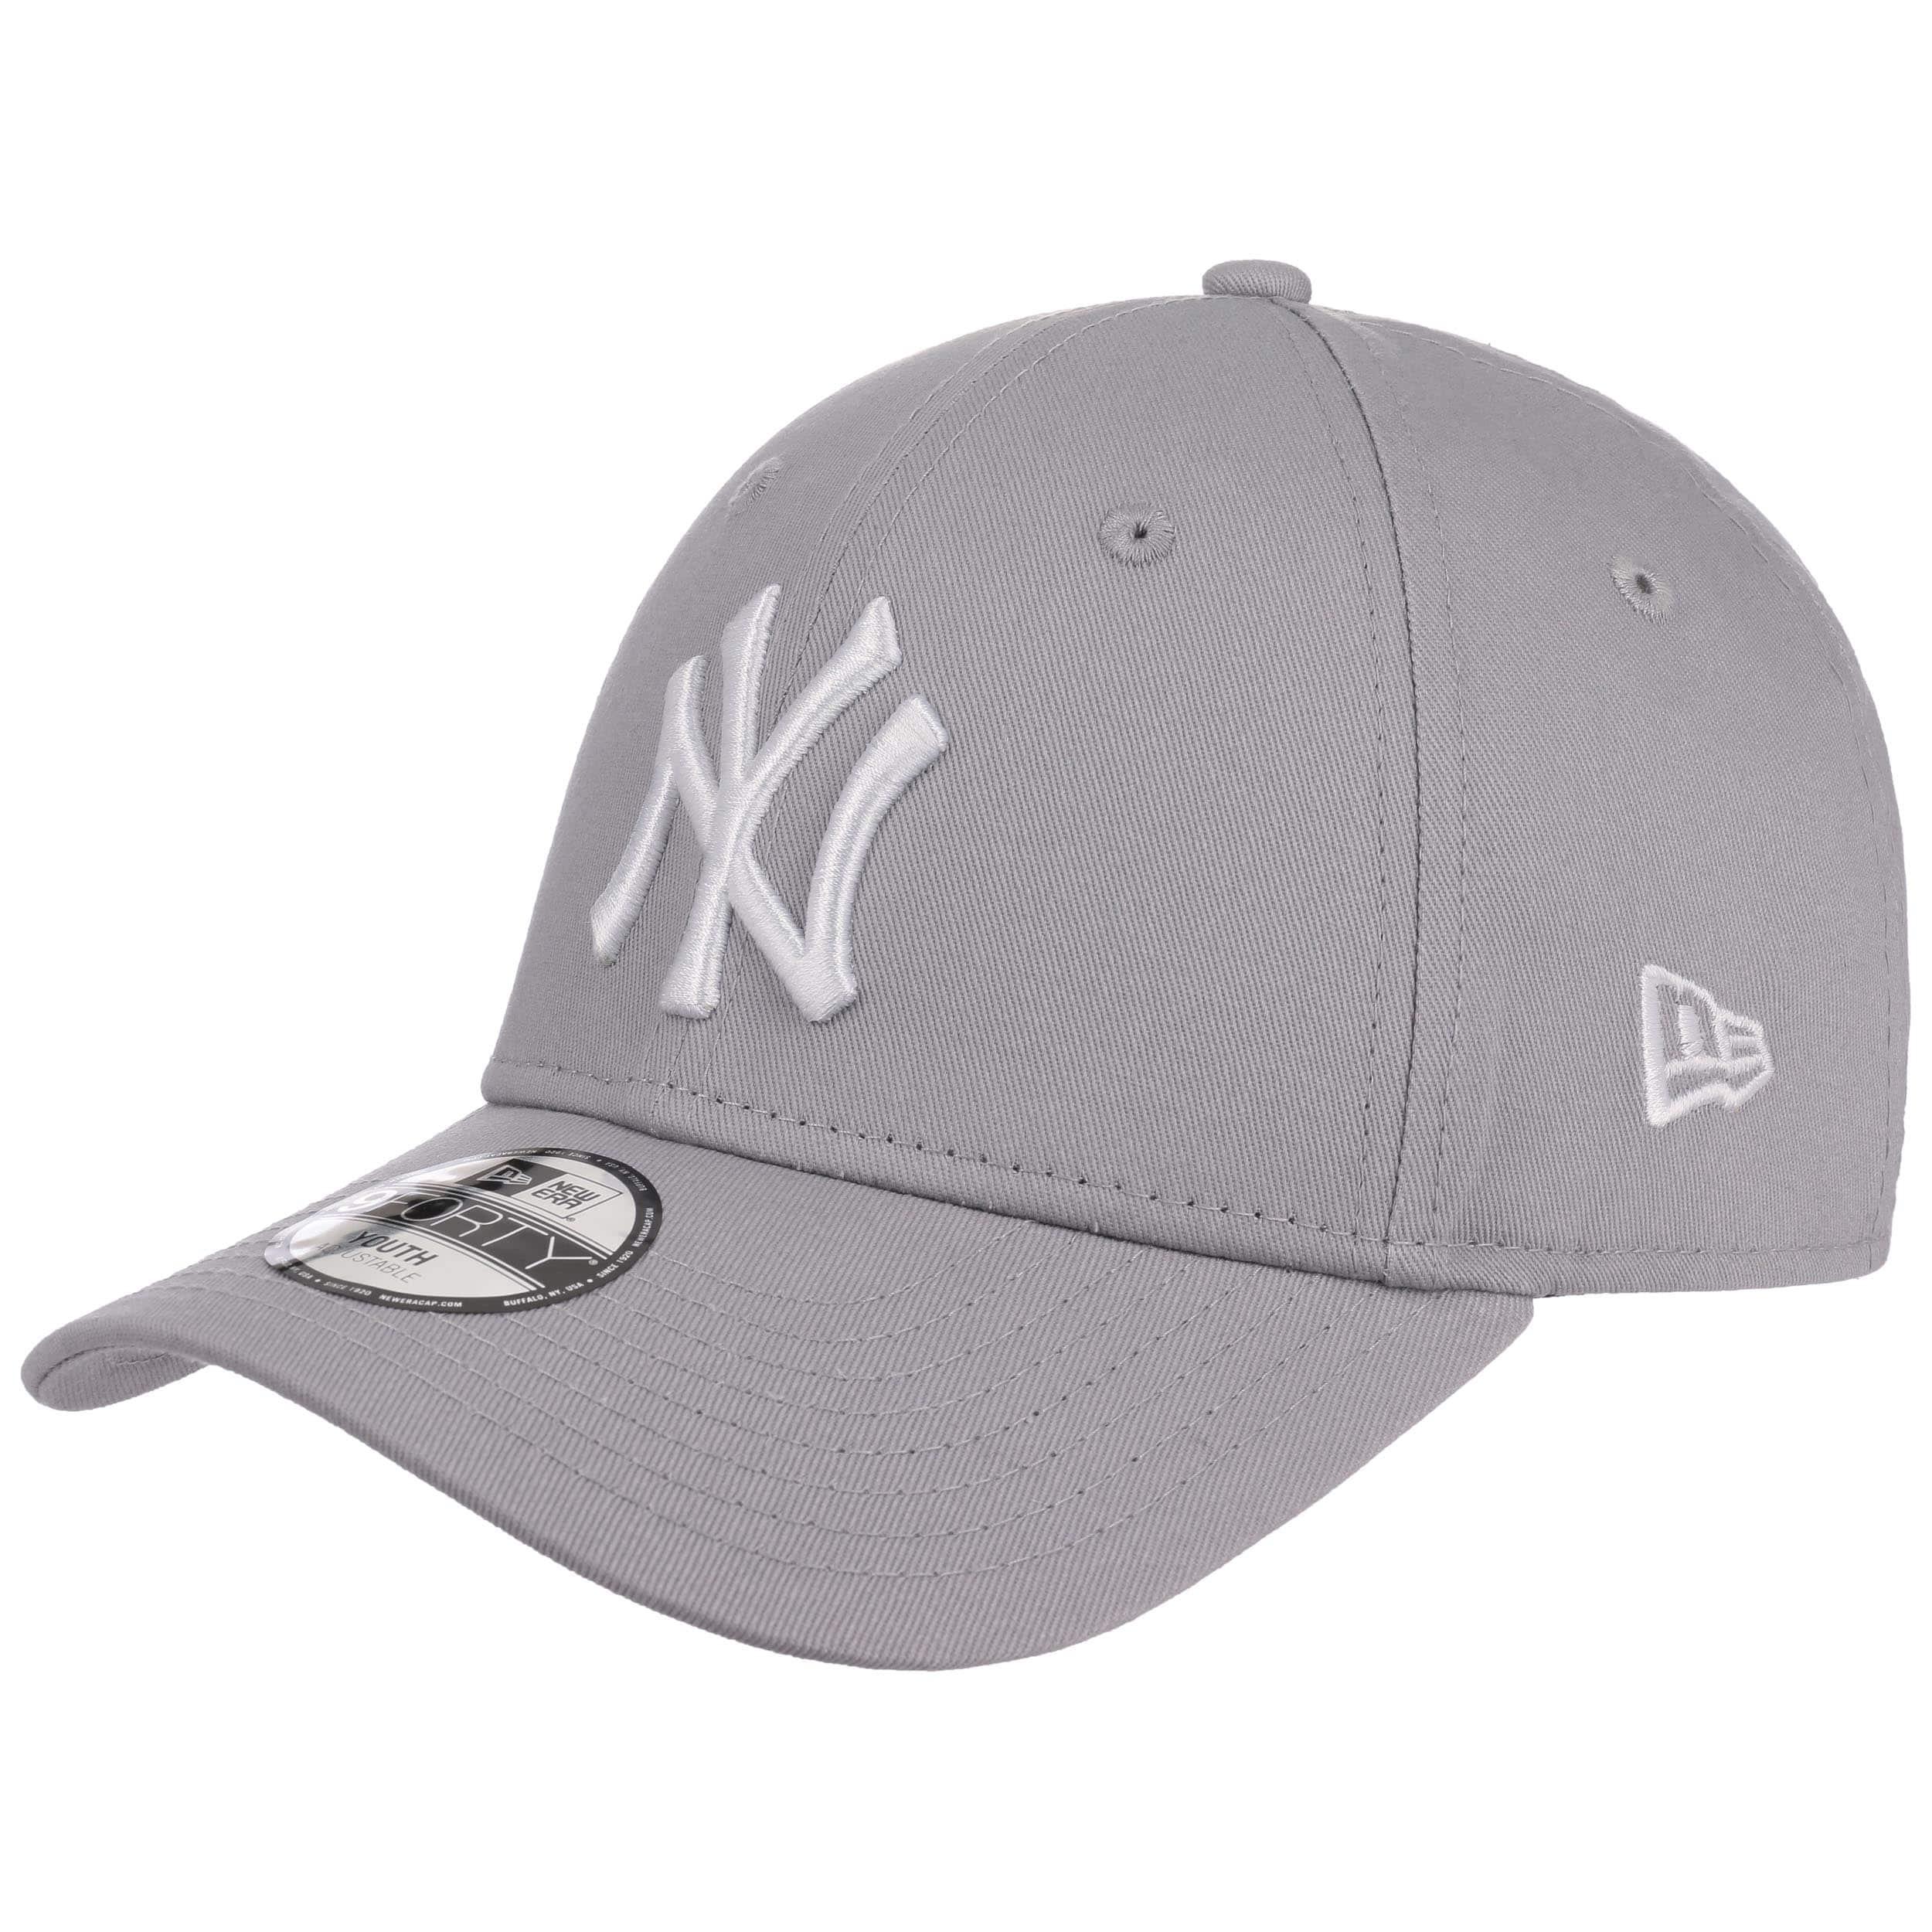 ... Cappellino 9Forty JUNIOR NY by New Era - grigio chiaro 6 ... c21c02c3ac46